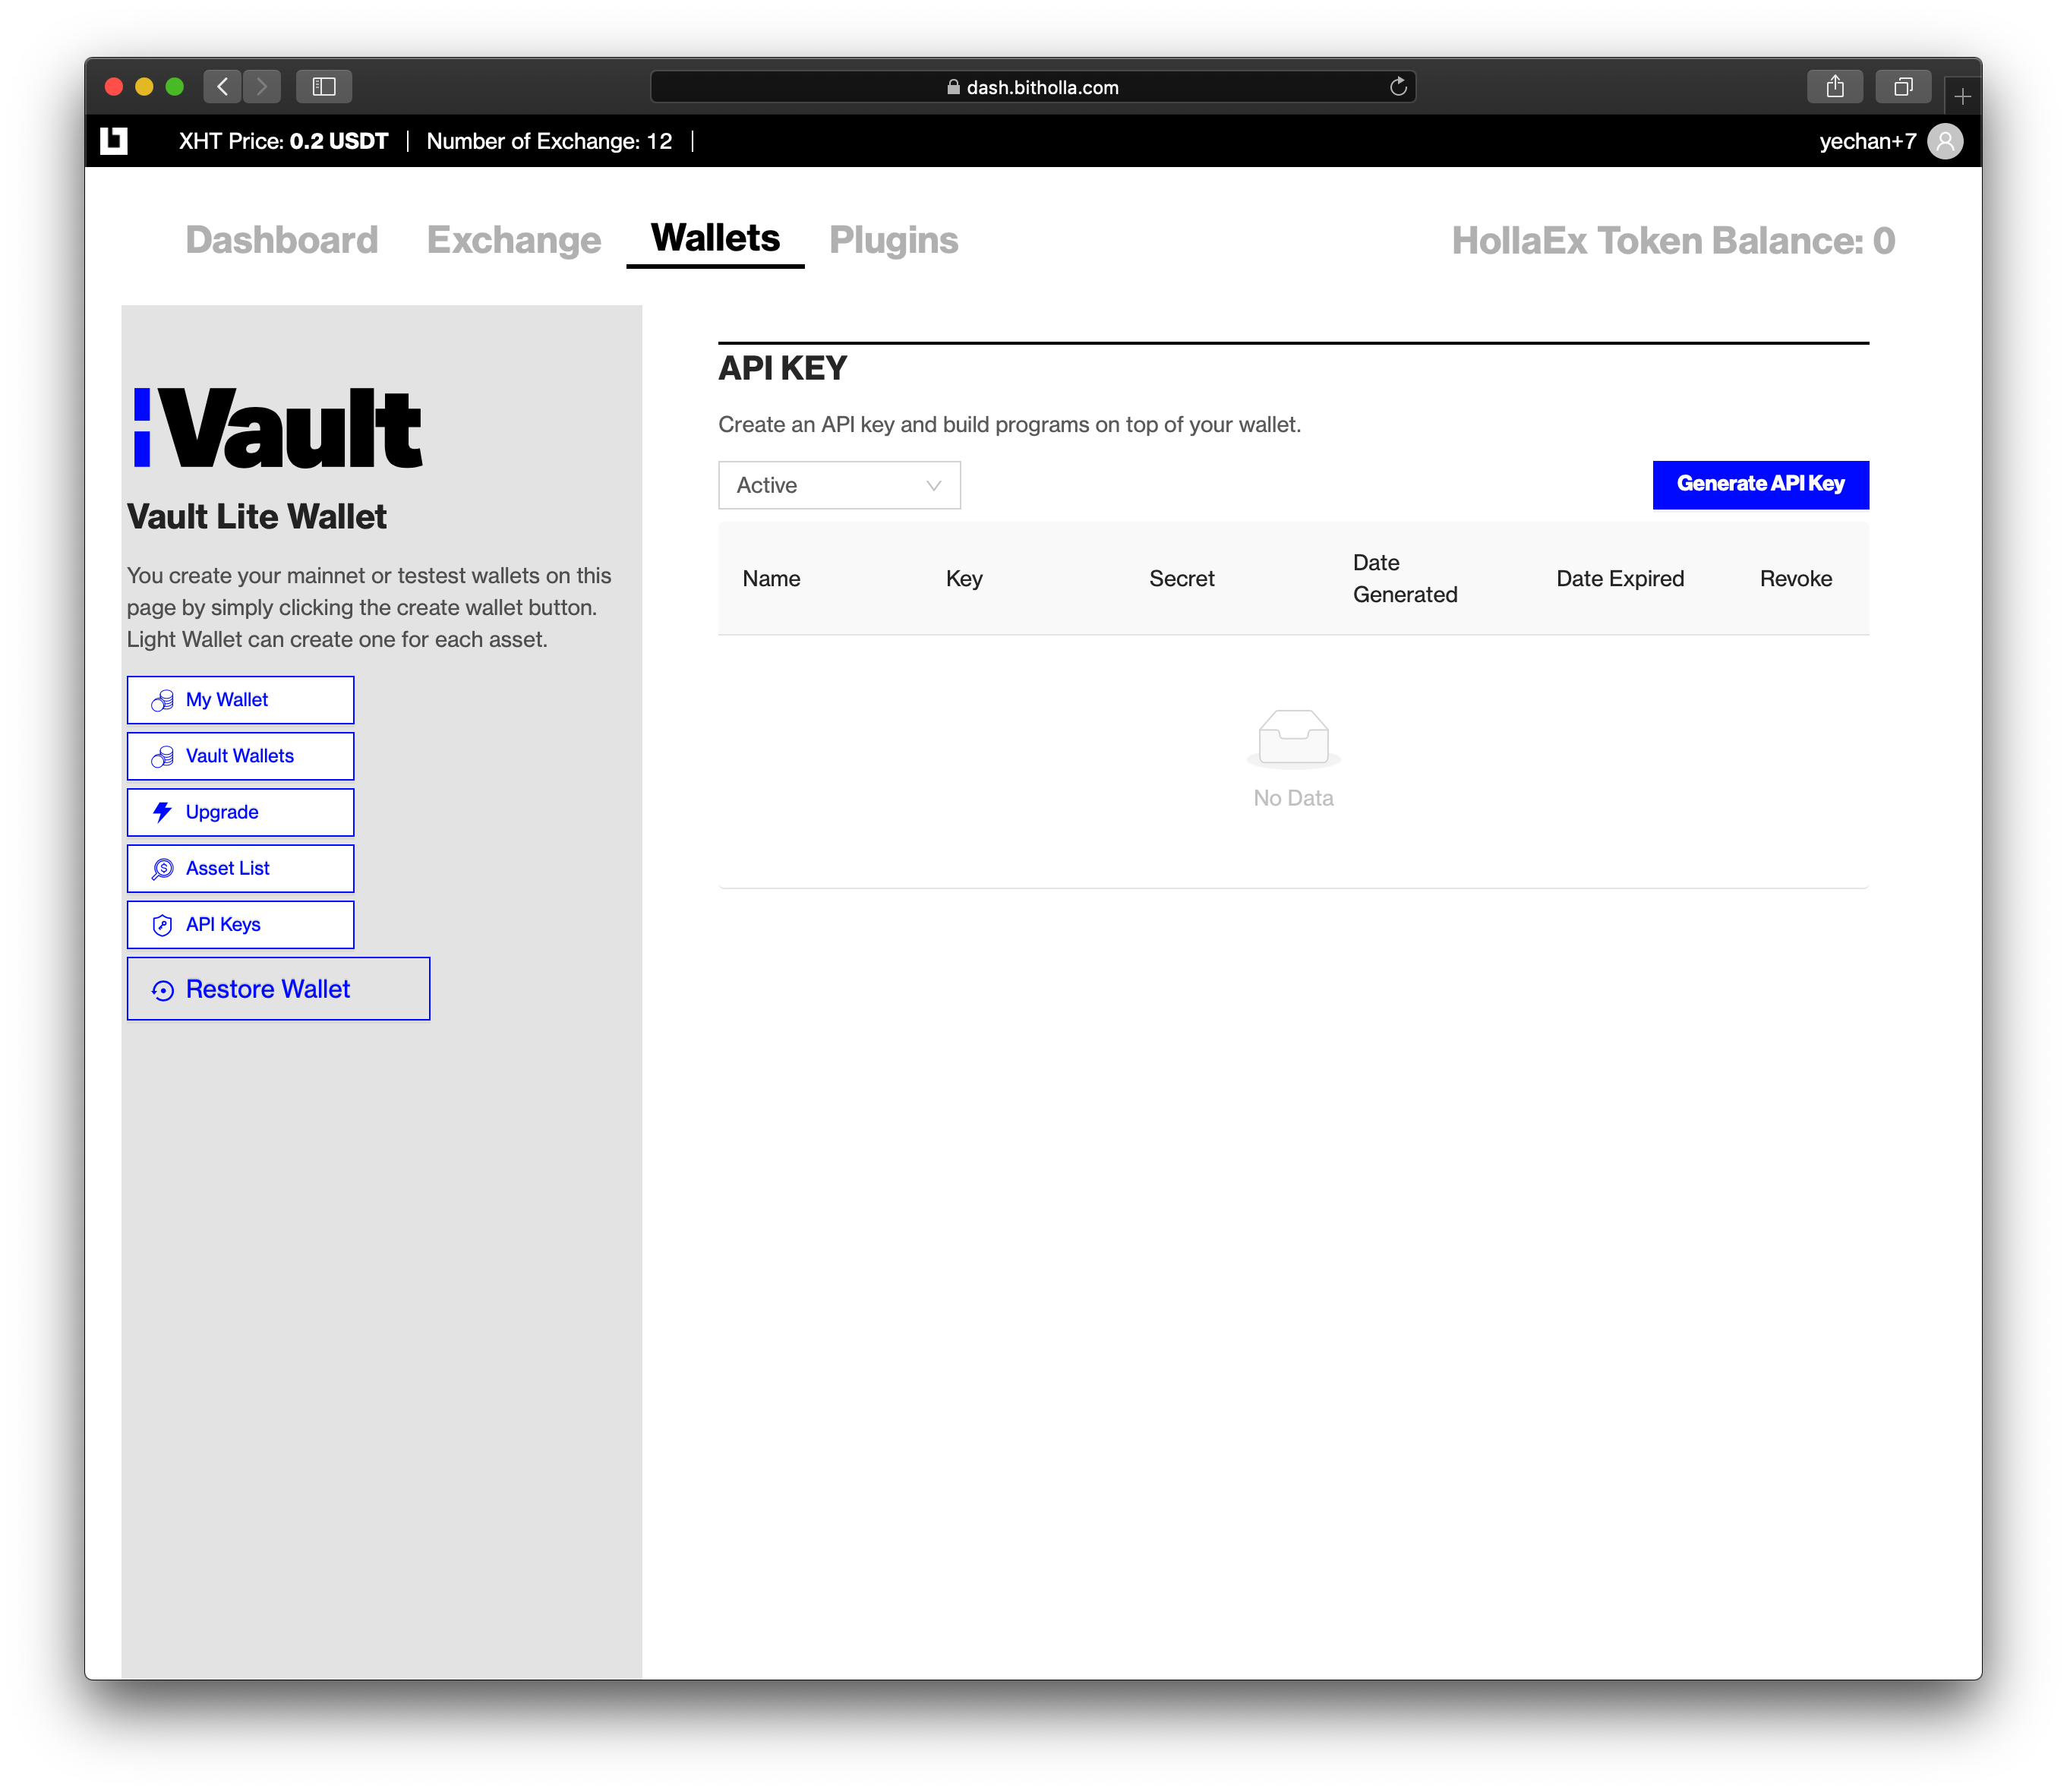 vault_generate_api_key_button